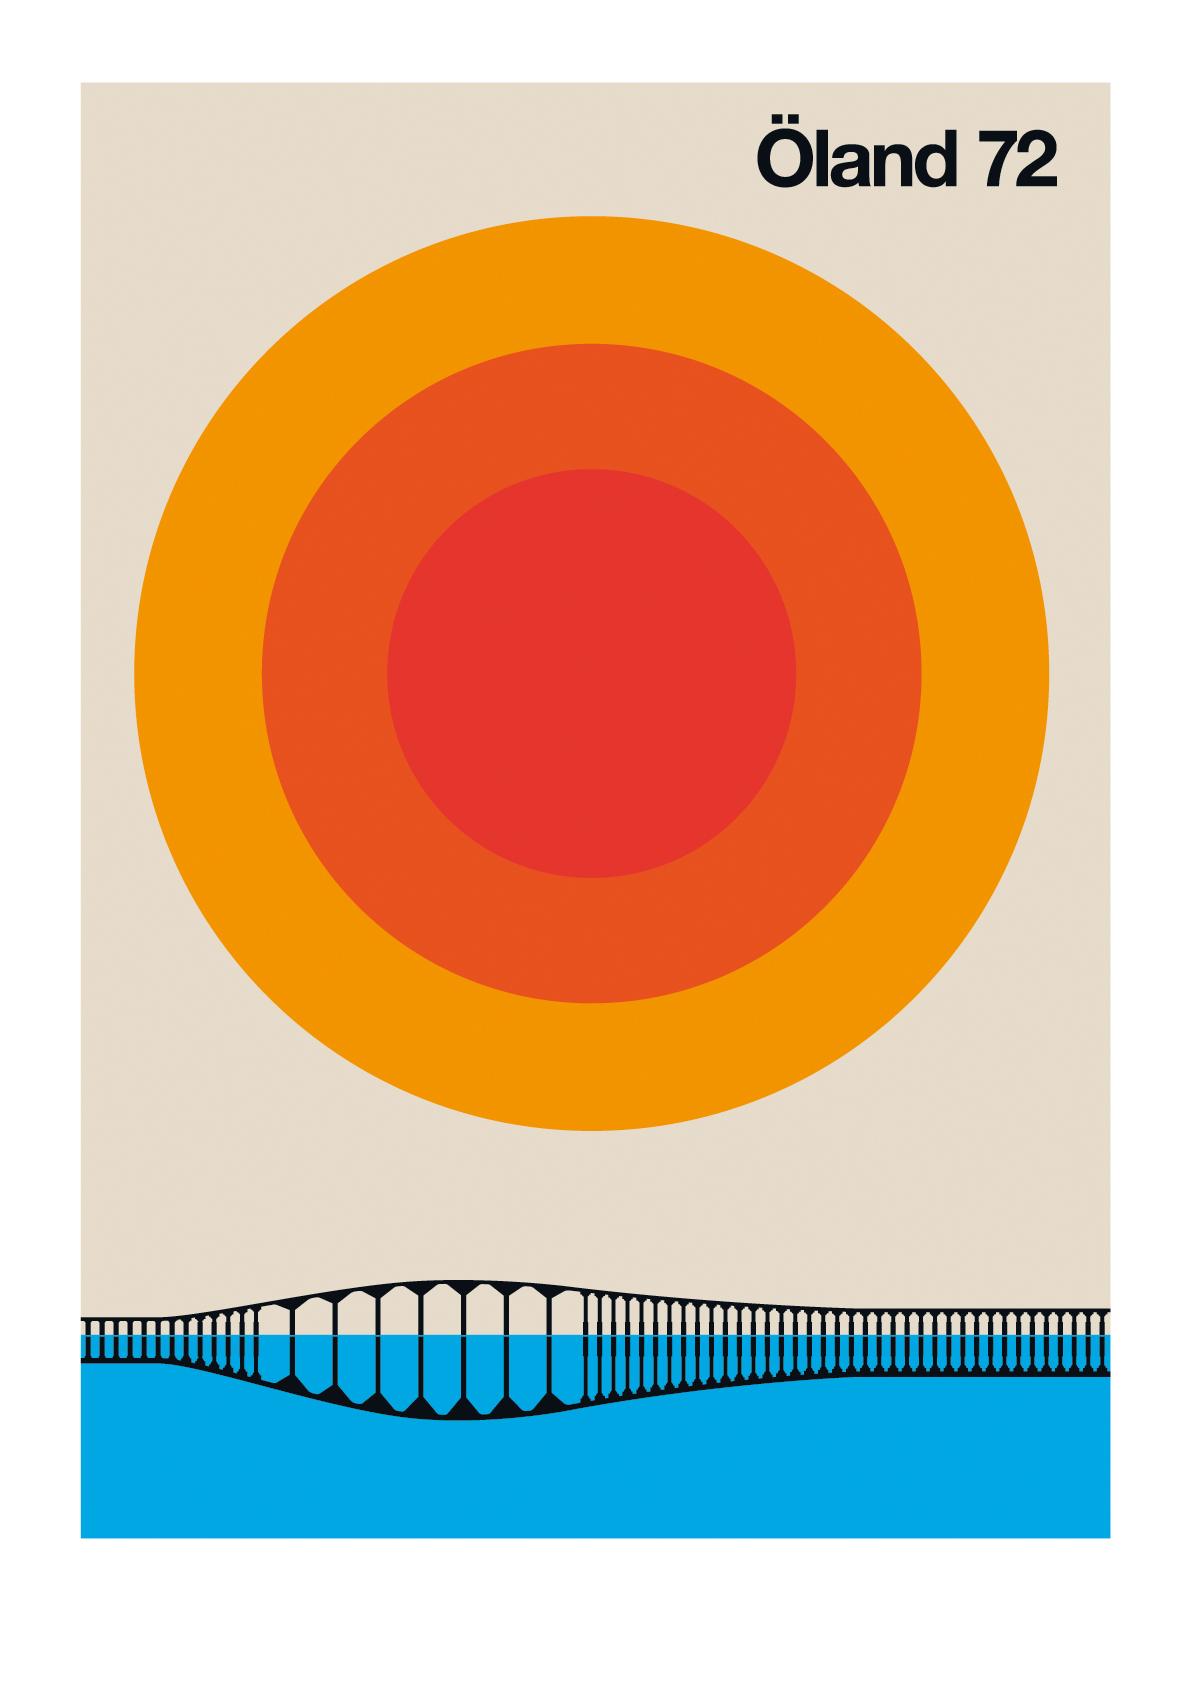 Bo Lundberg Illustration Exhibition Öland